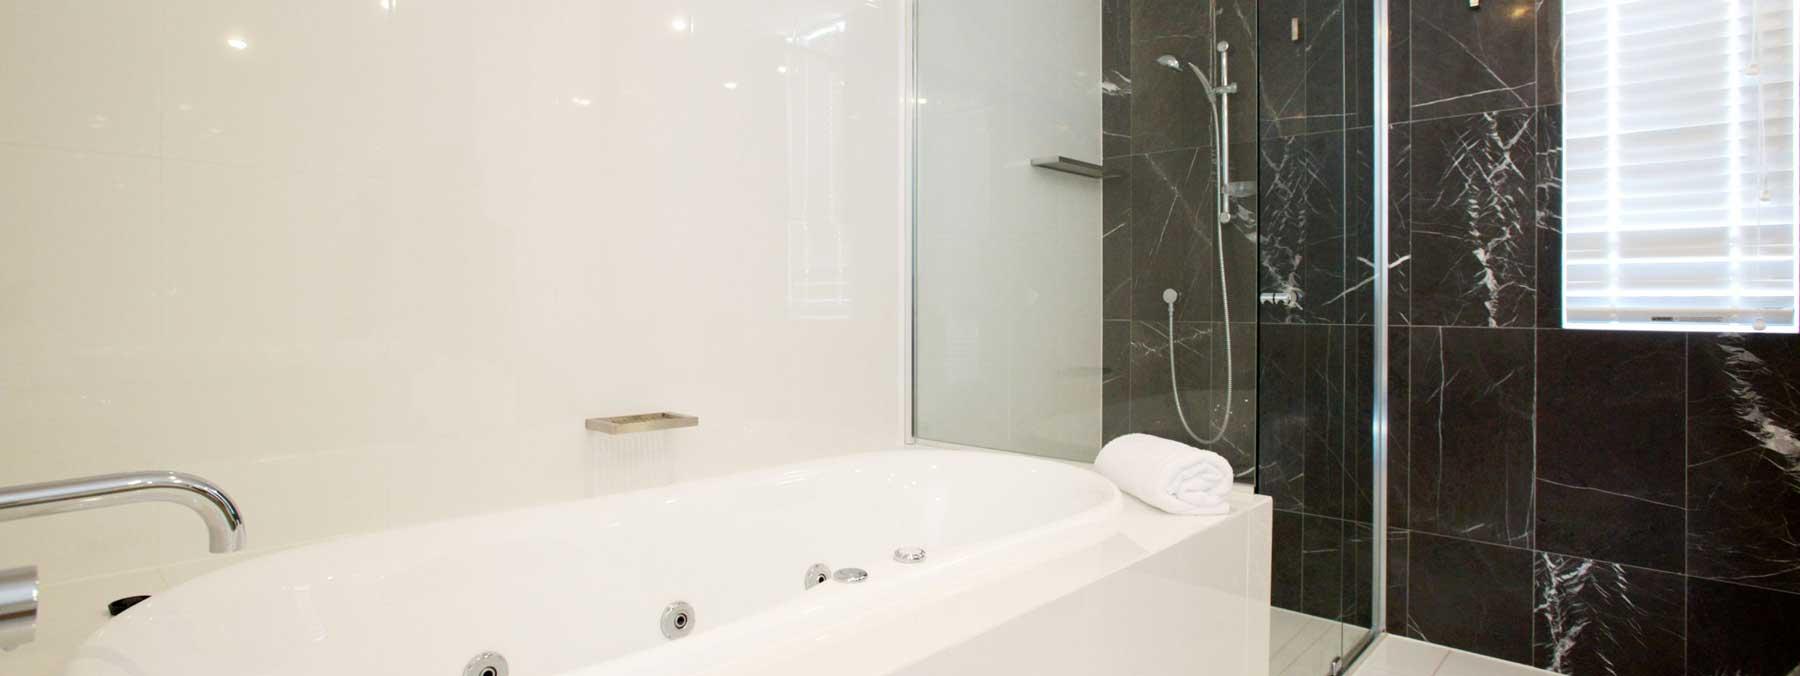 Bathroom design and renovations castle hill - Fantastic Bathroom Renovations Baulkham Hills